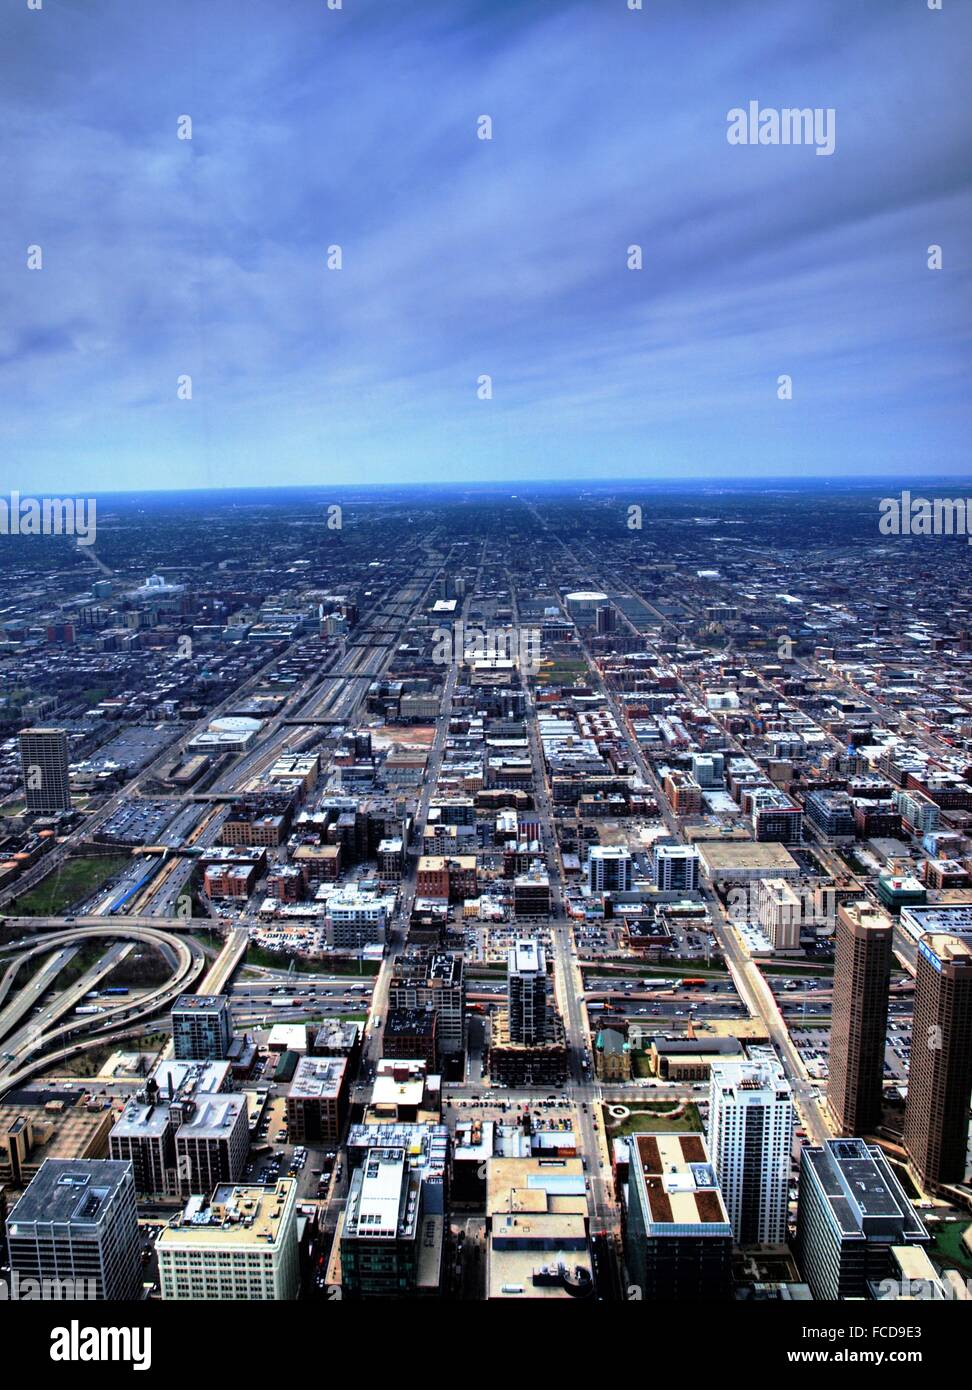 Modern City Sprawl - Stock Image